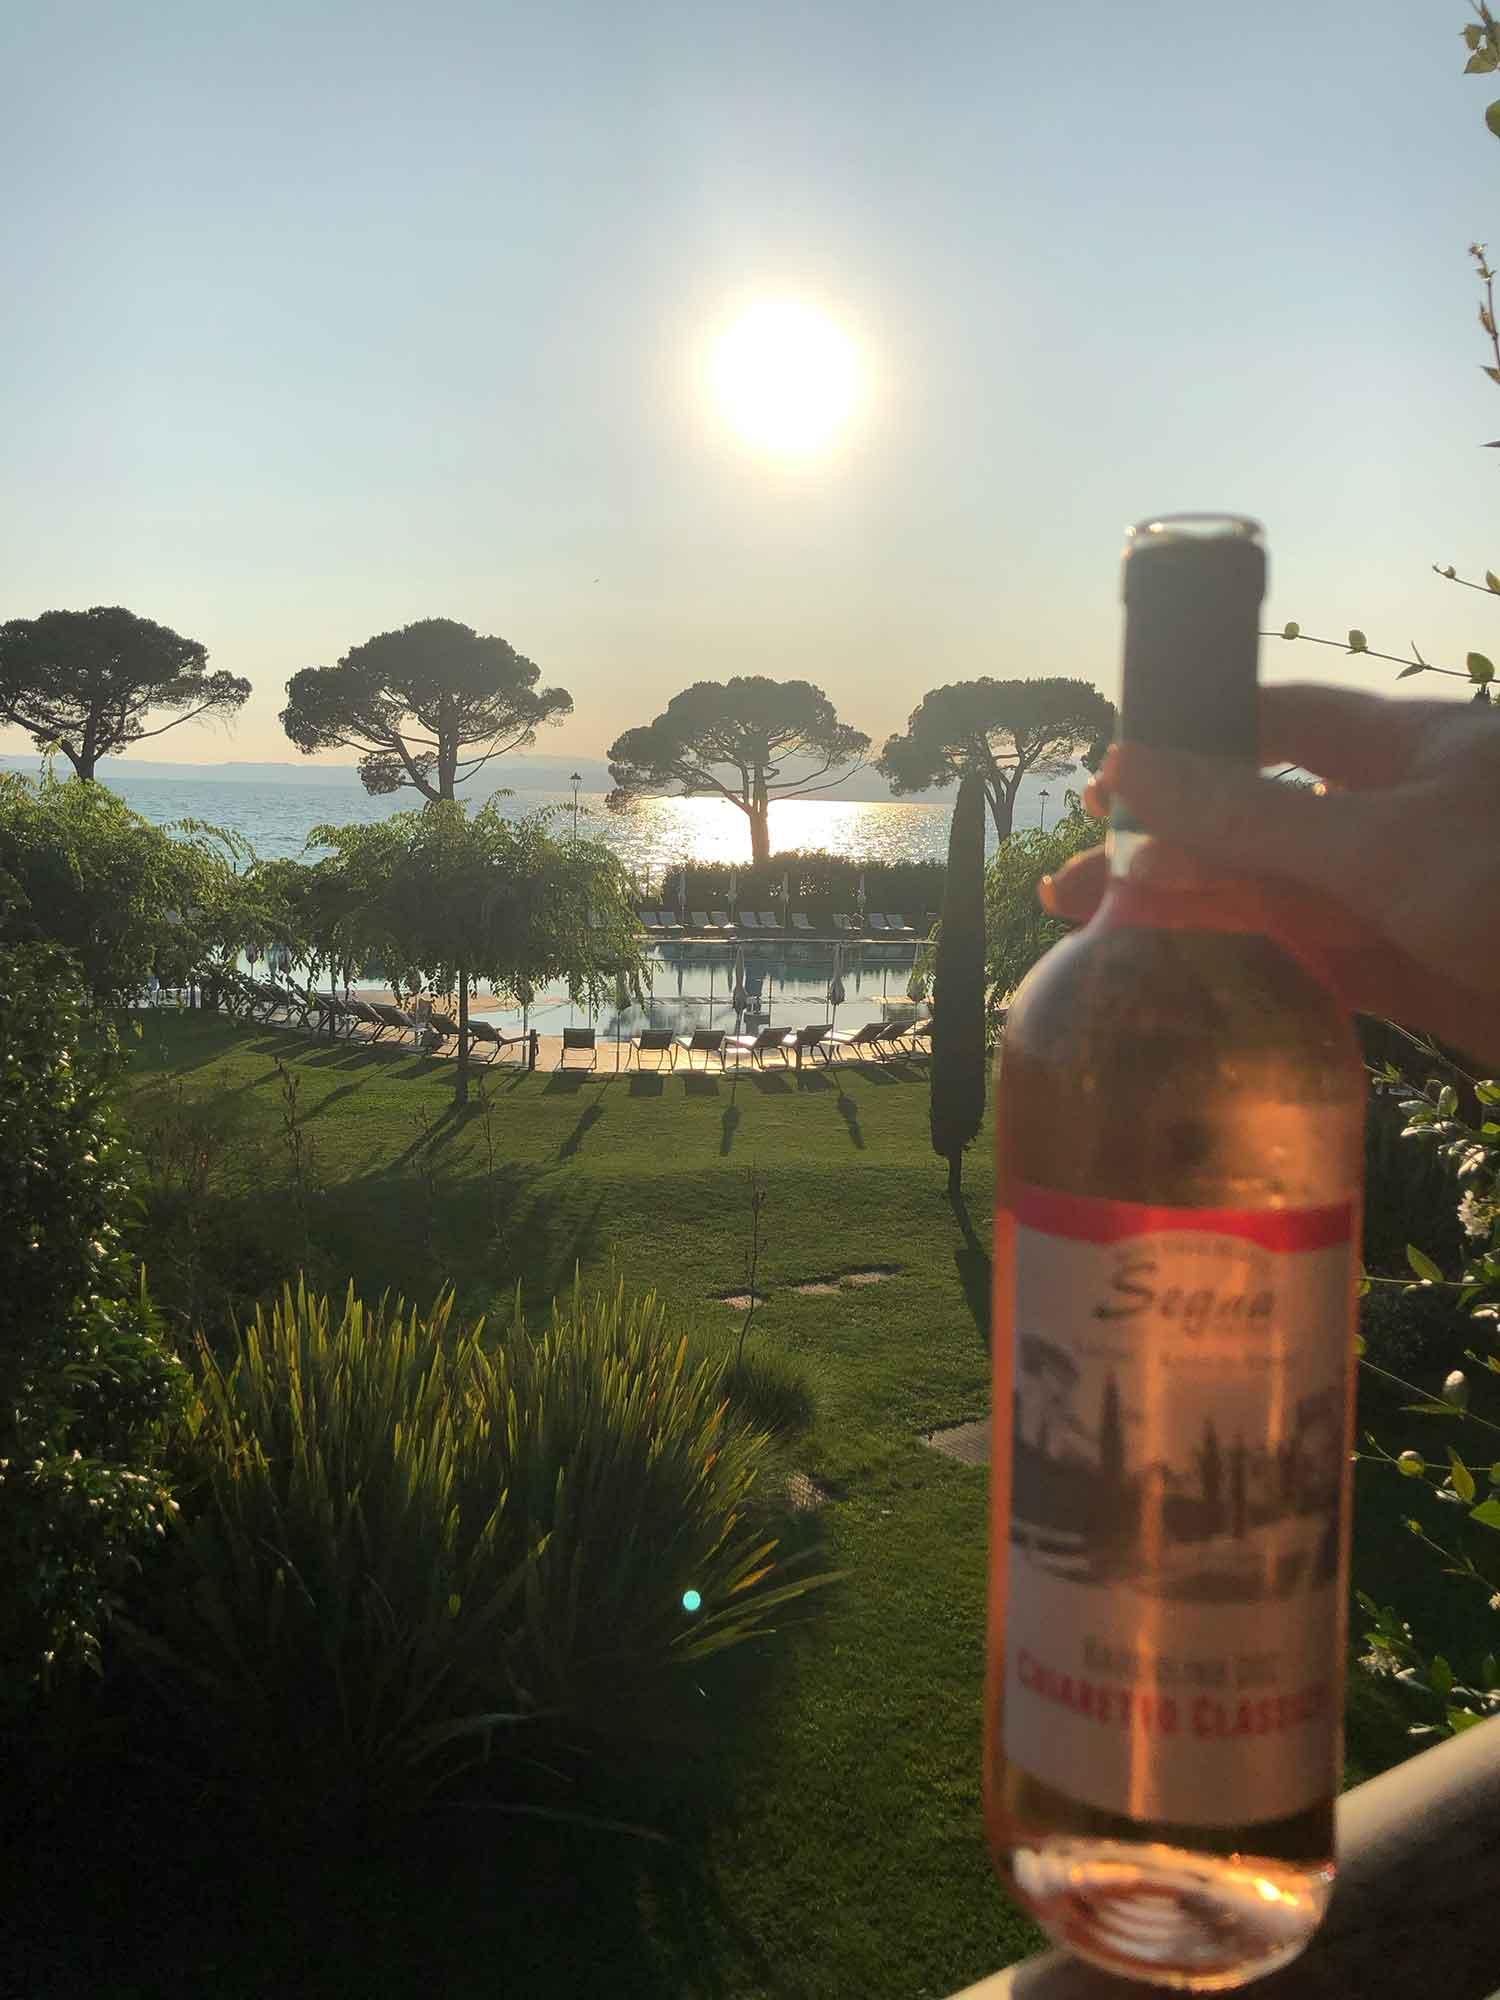 Hotel Corte Valier , Lazise, Lake Garda sunset drinks and balcony views